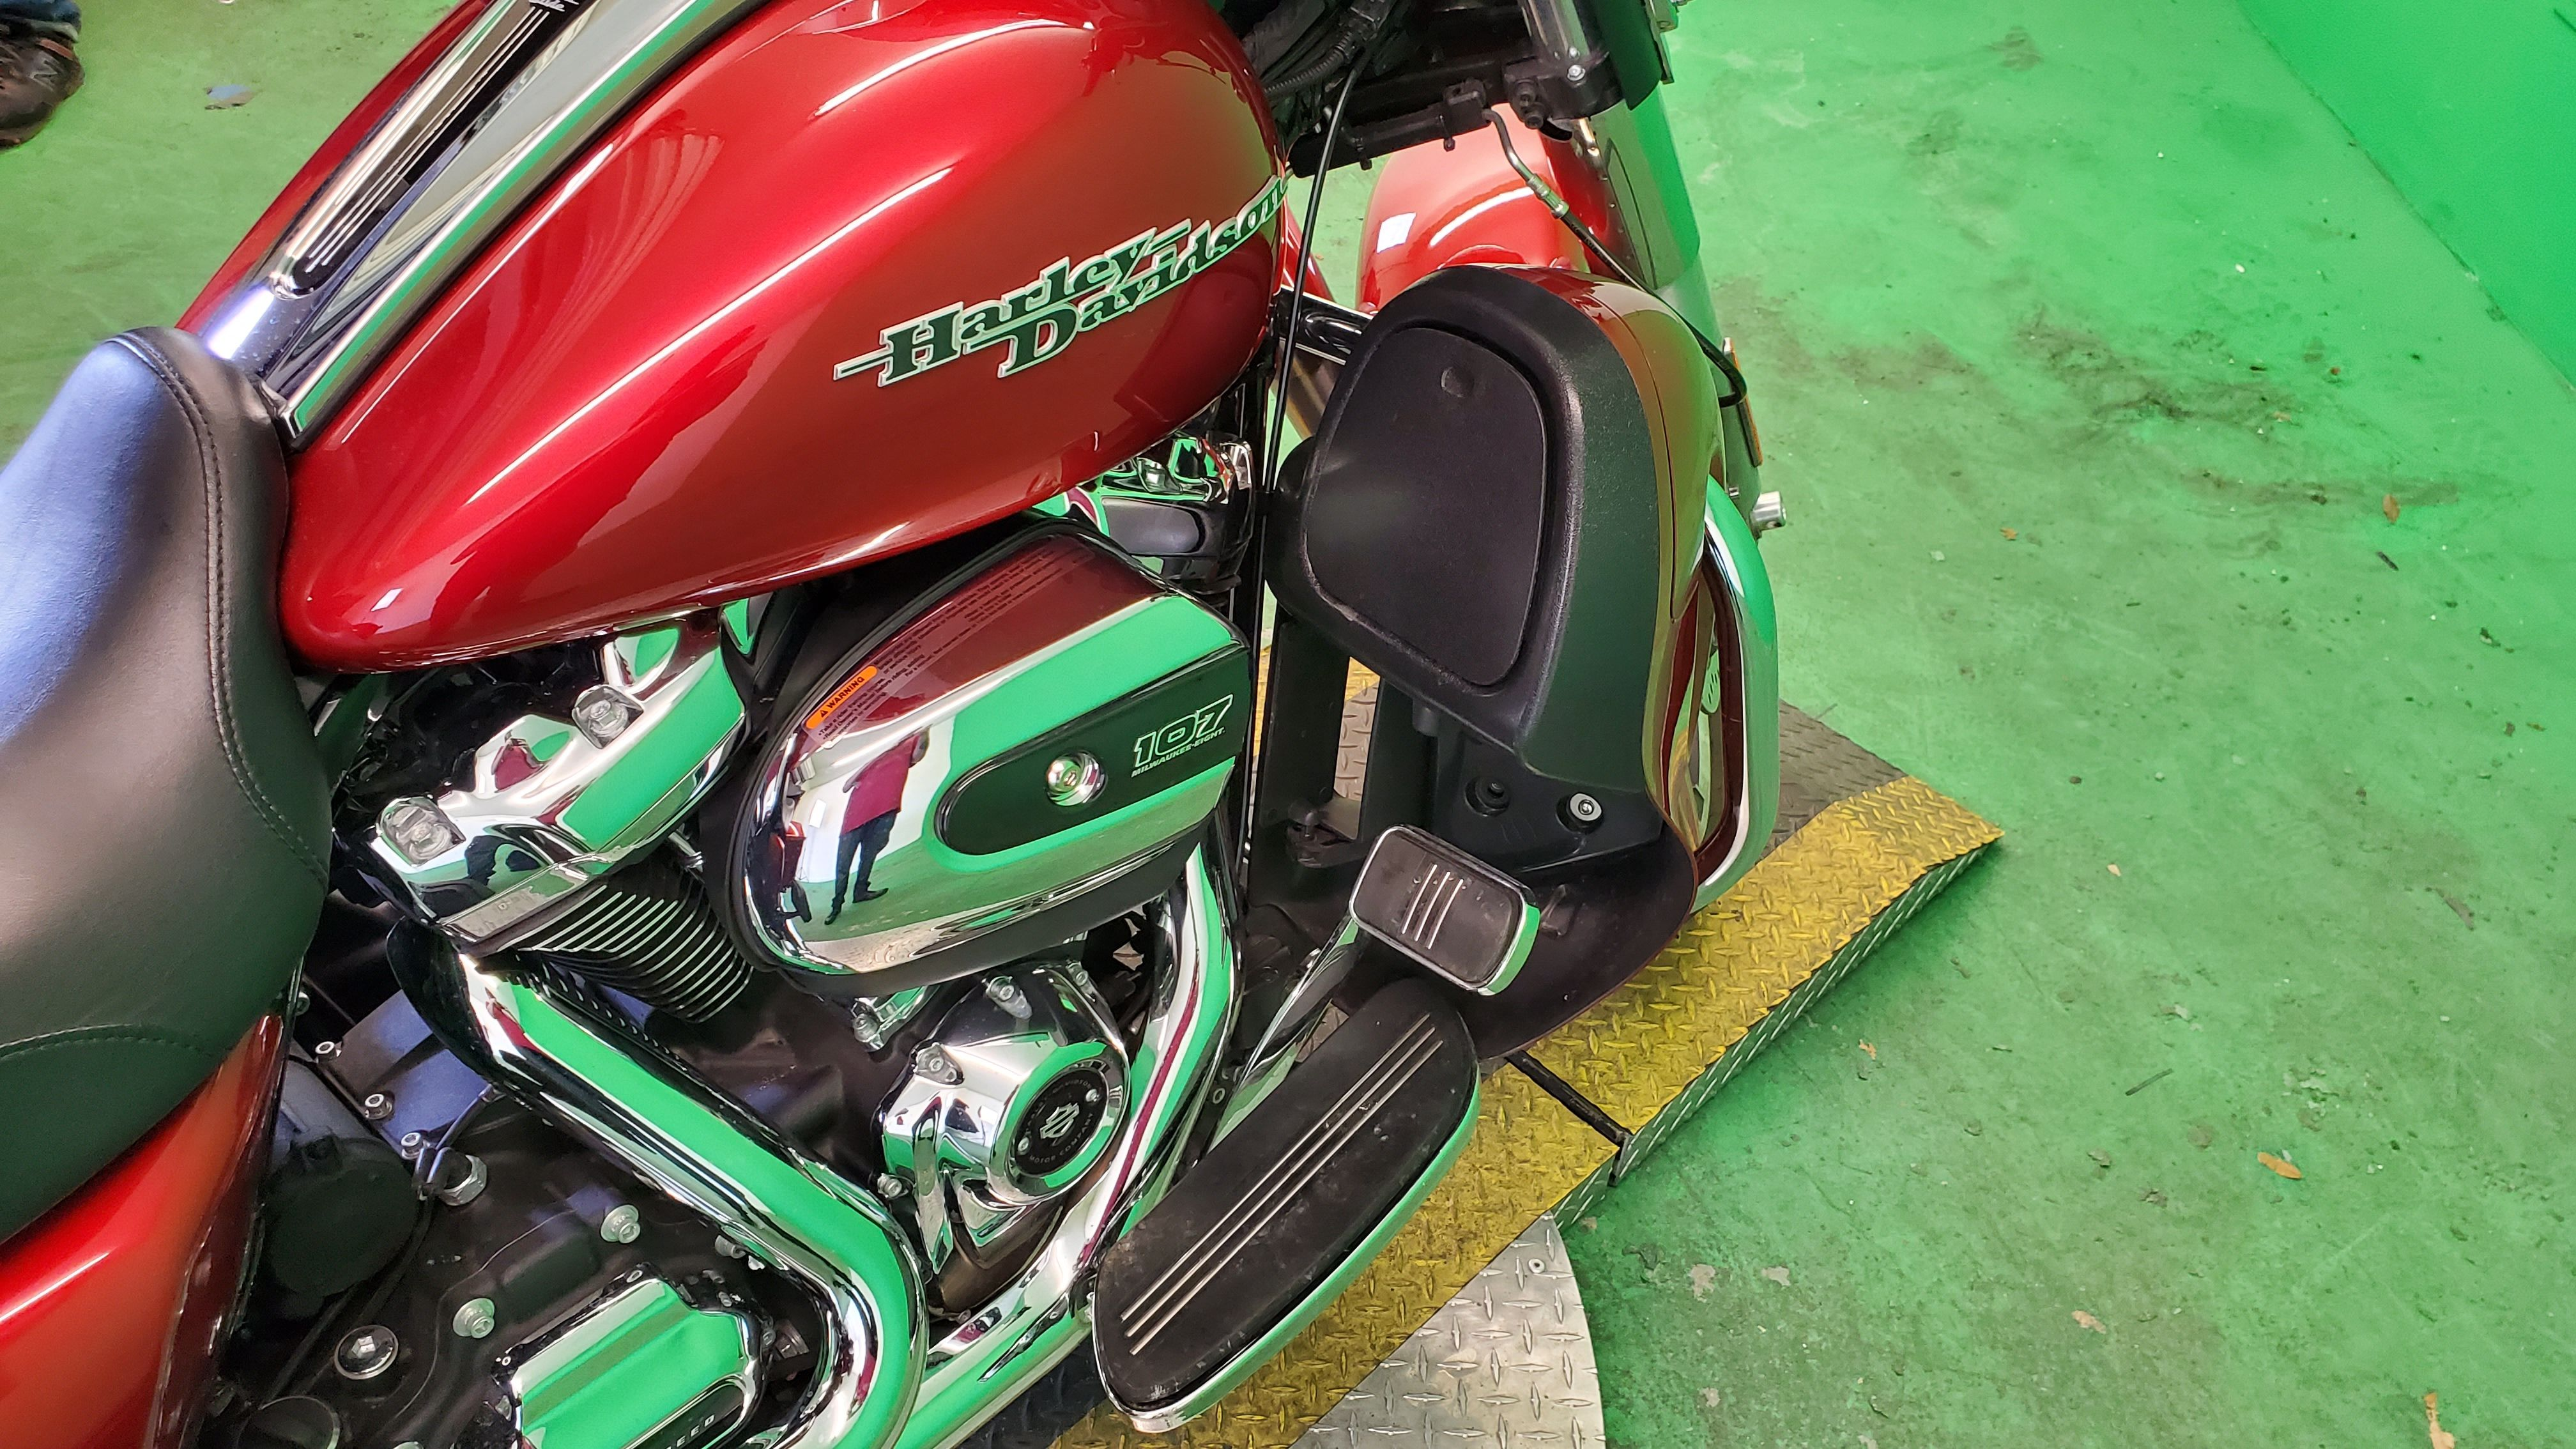 Pre-Owned 2018 Harley-Davidson Street Glide FLHX